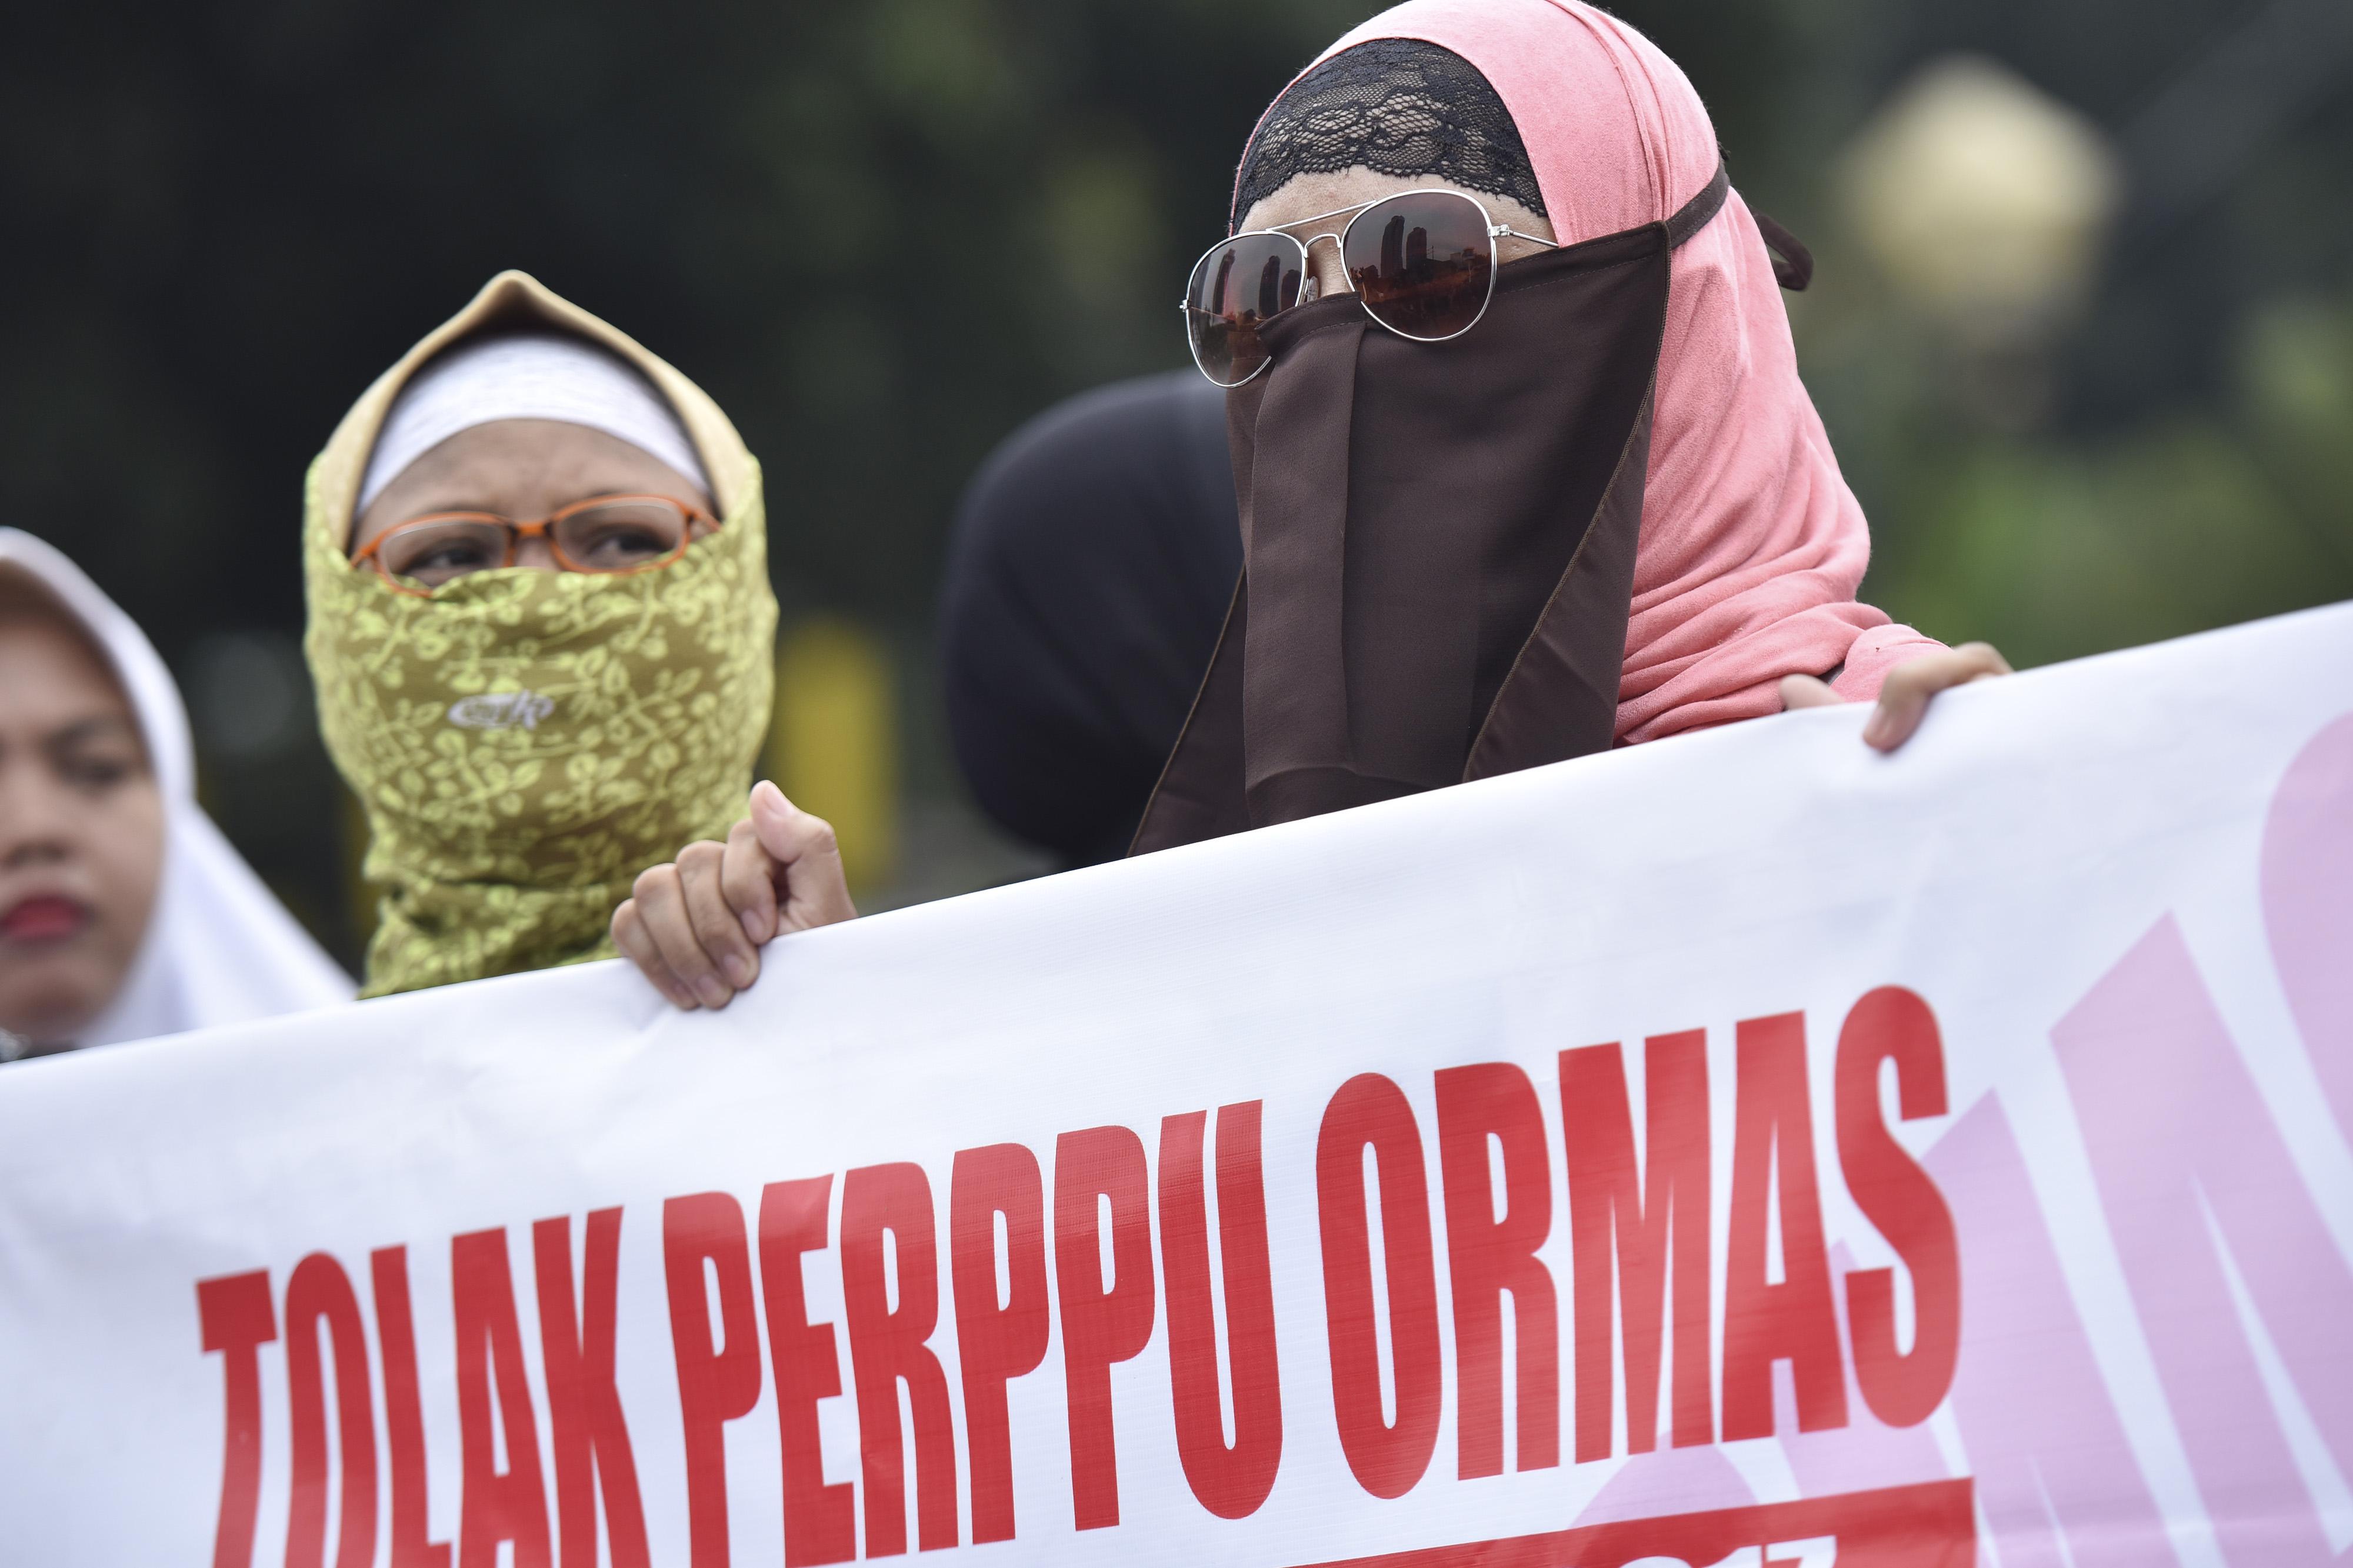 AKSI. Pengunjuk rasa dari sejumlah ormas Islam melakukan aksi di Bundaran Patung Kuda, Jakarta, Selasa, 18 Juli. Foto oleh Wahyu Putro A/ANTARA